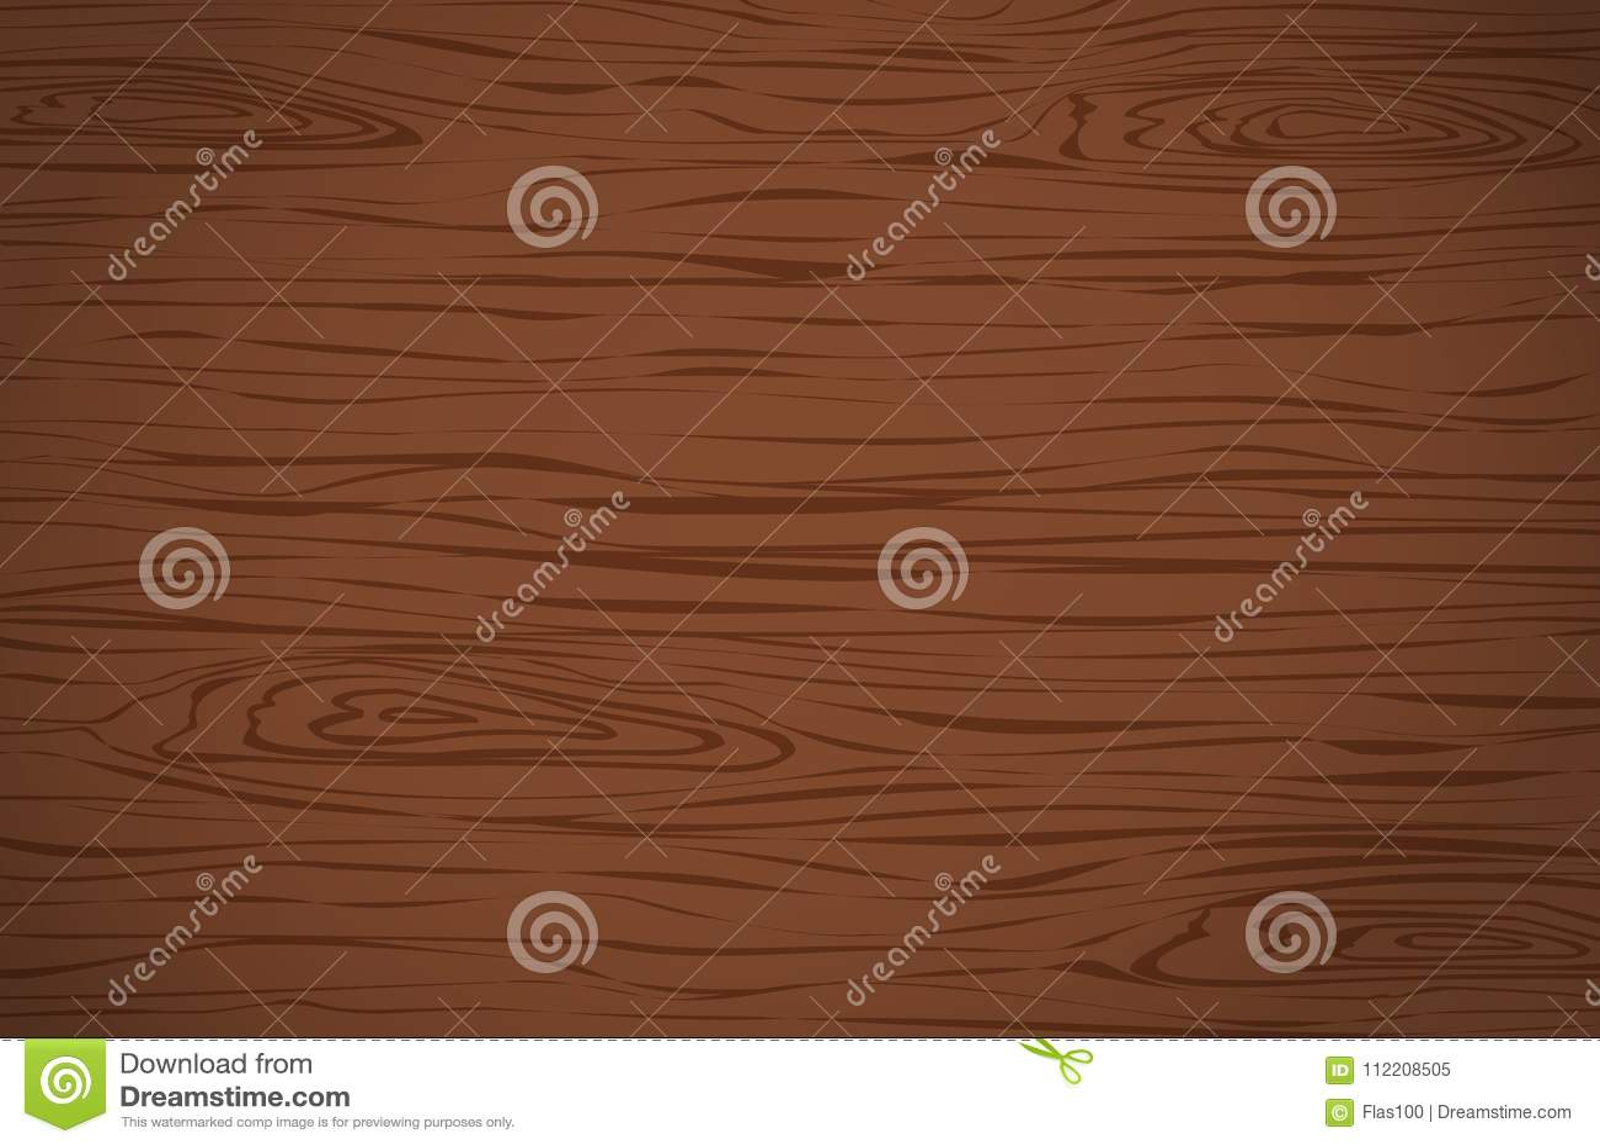 Hölzerner Fußbodenbelag ~ Dunkelbrauner hölzerner ausschnitt hackendes brett tabelle oder